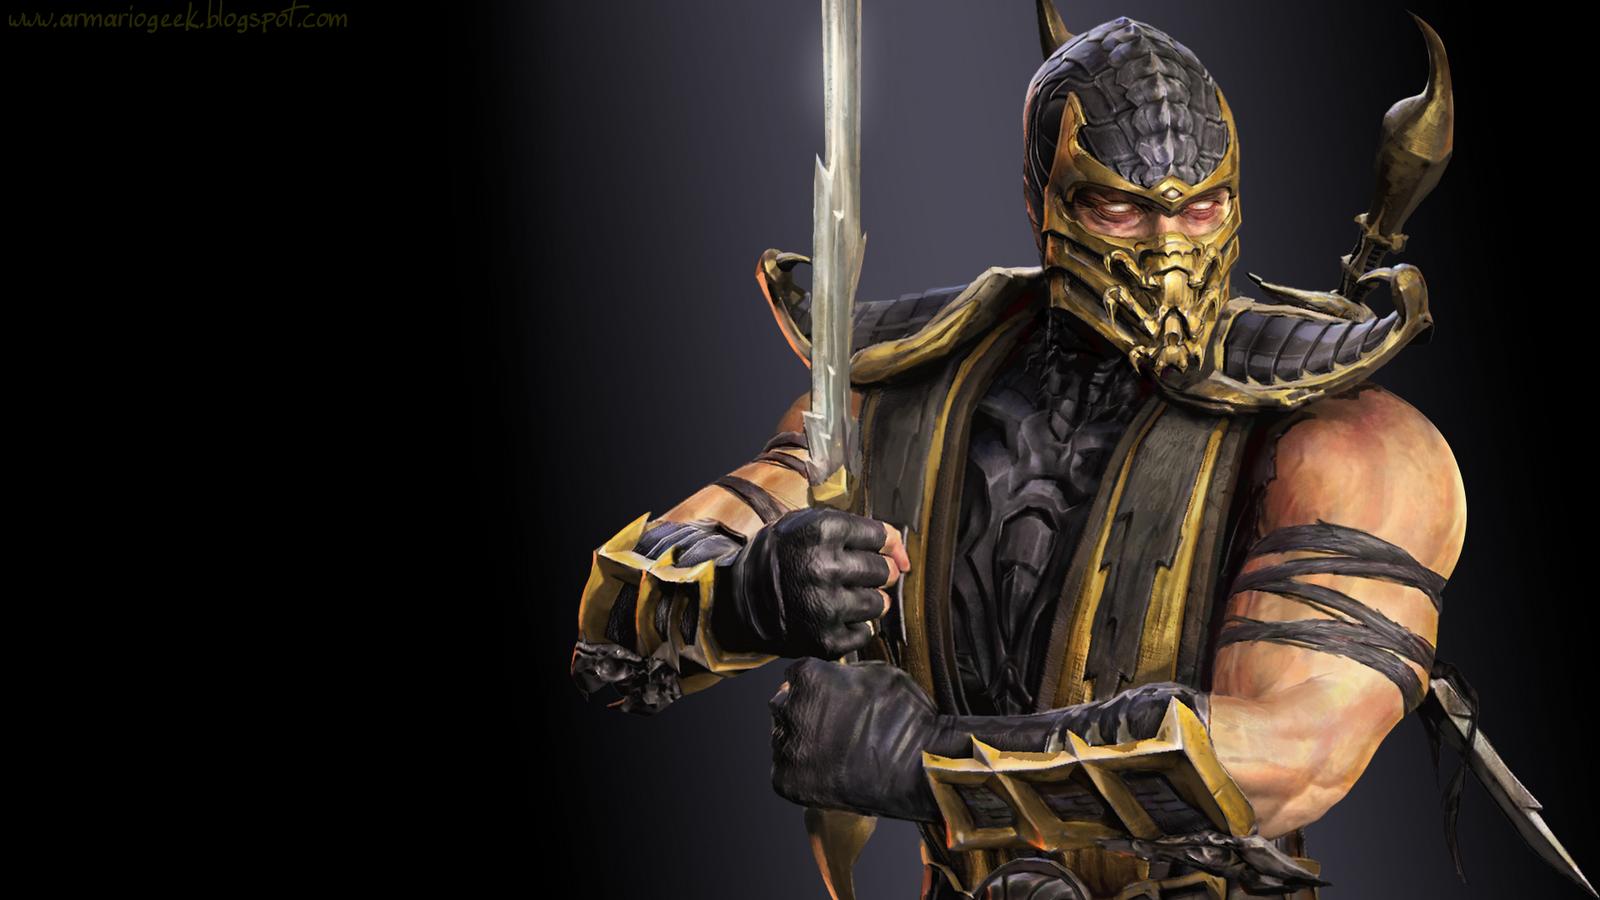 Wallpaper] Mortal Kombat IX Scorpion Armario Geek 1600x900